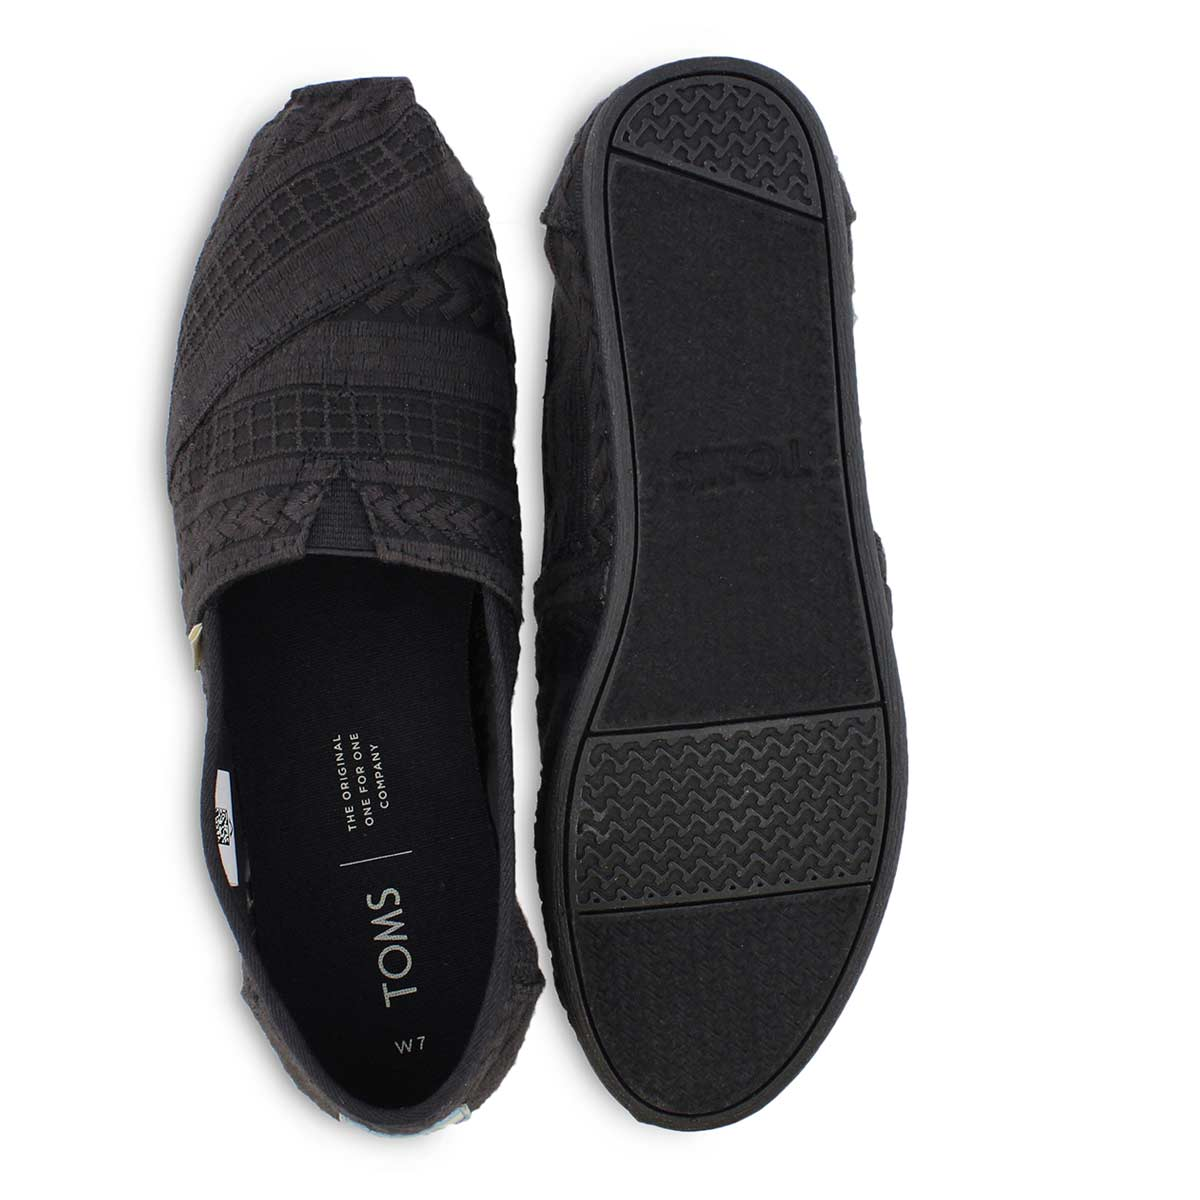 Lds Alpergata black casual loafer